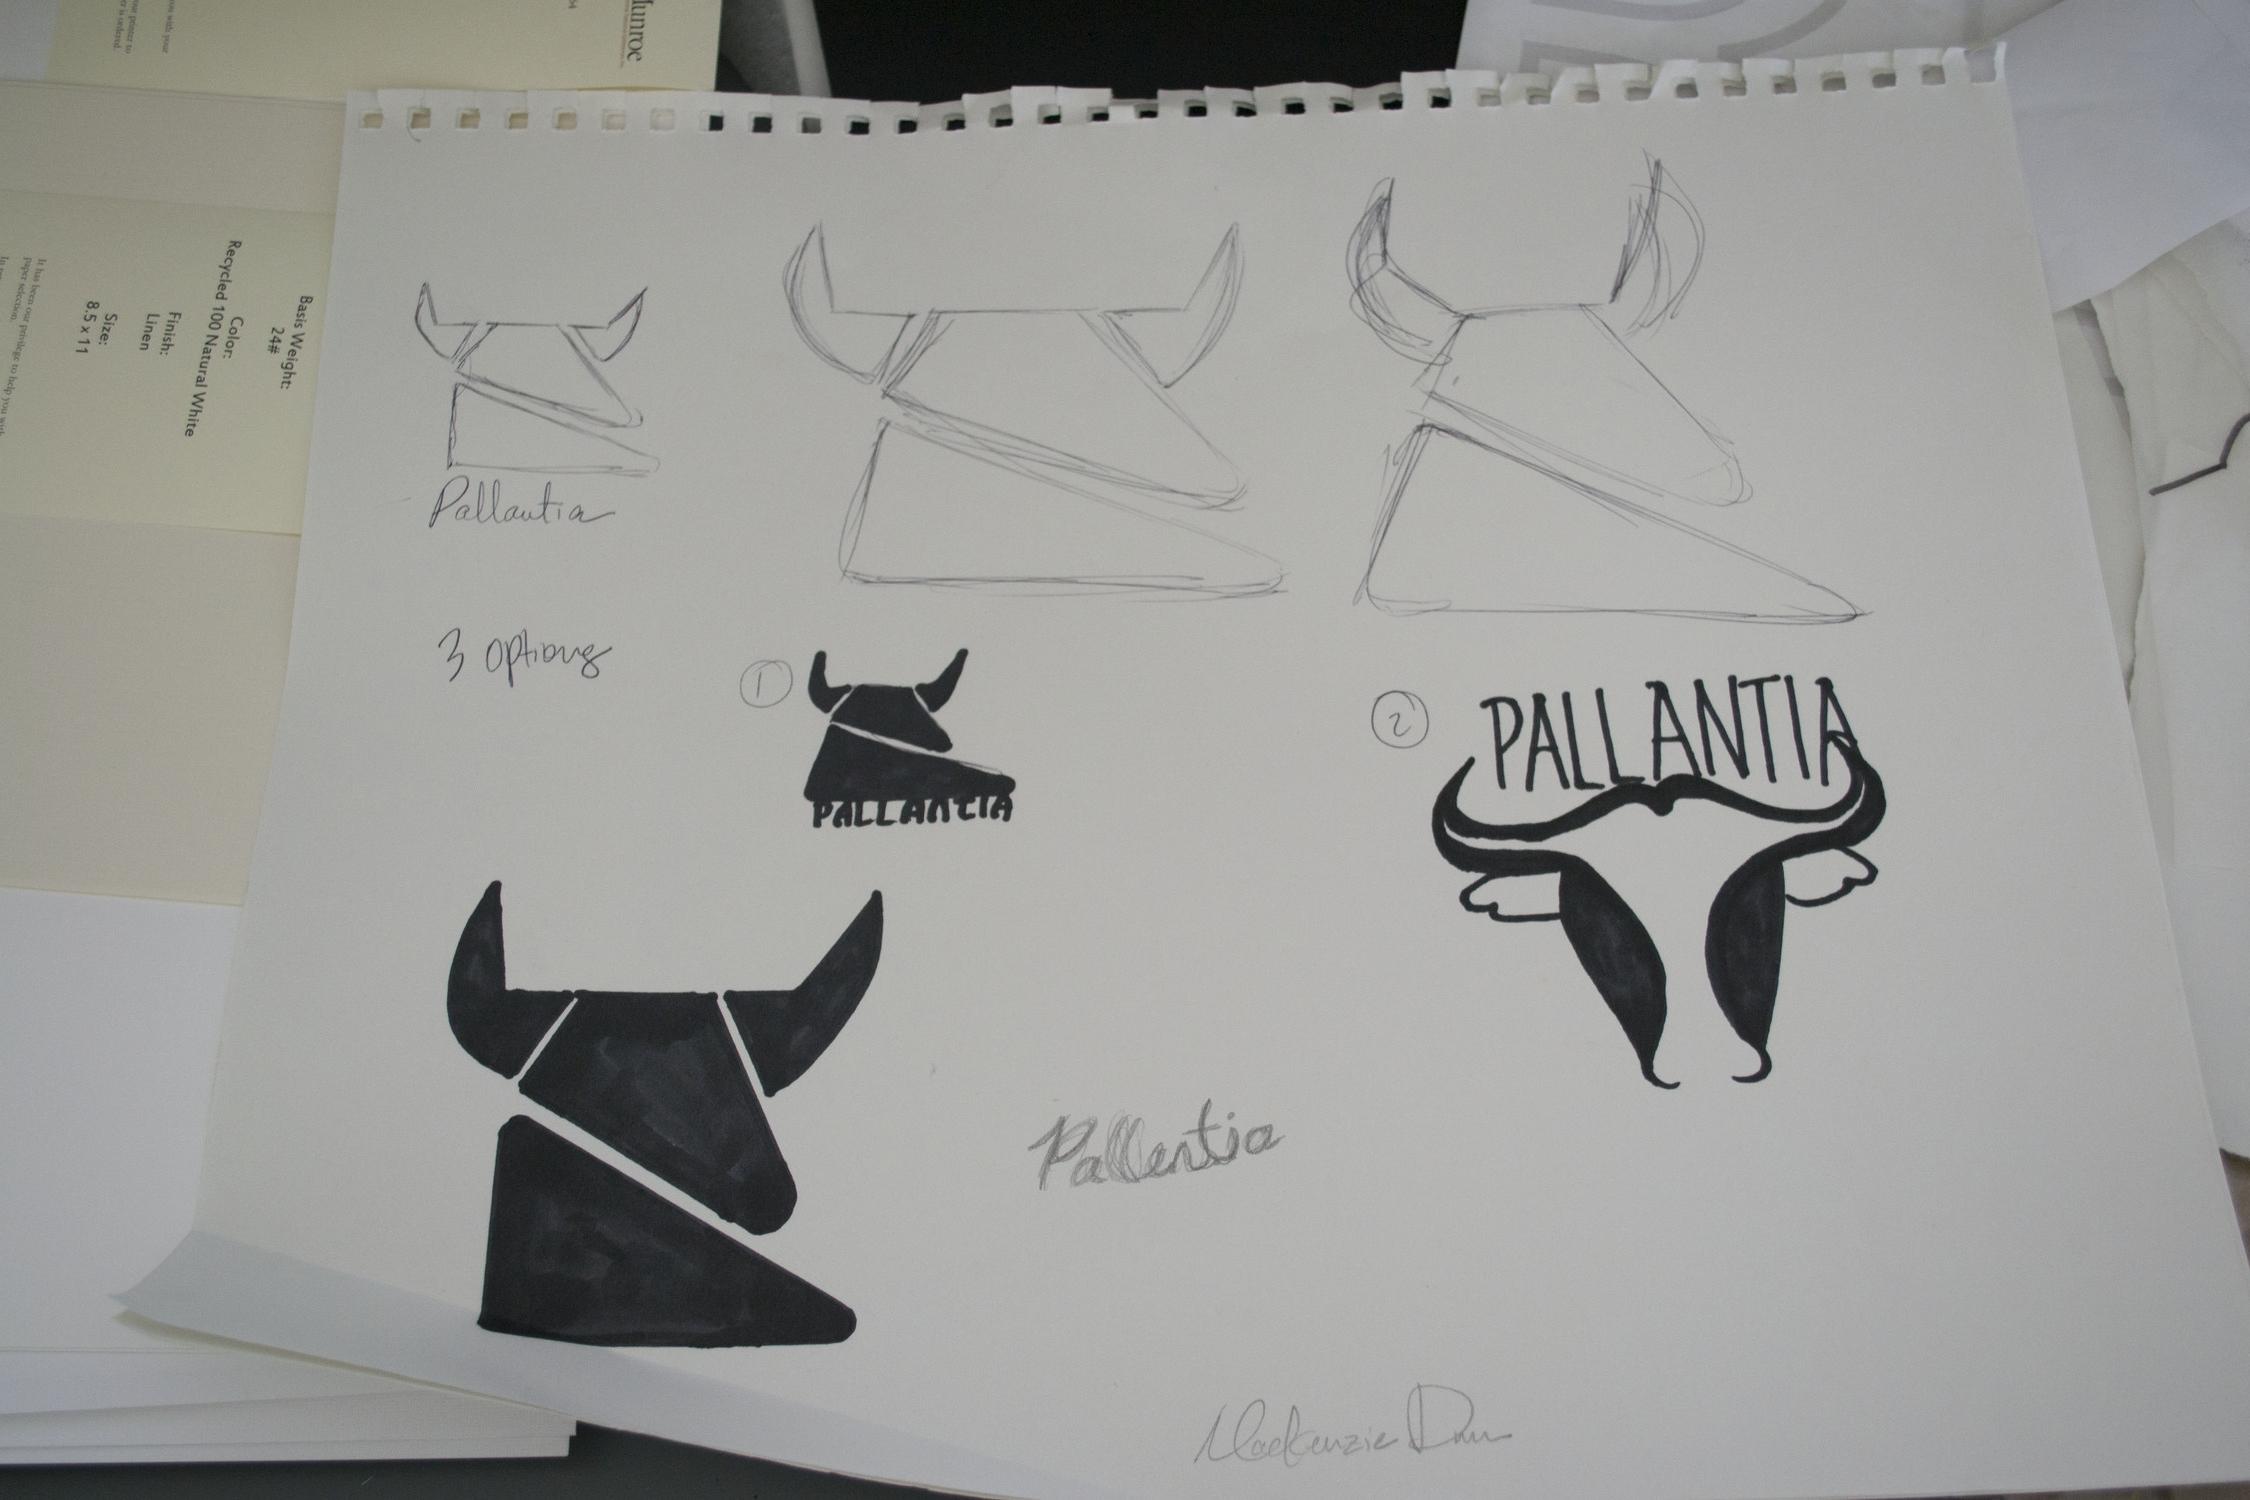 pallantia_sketches_7.JPG